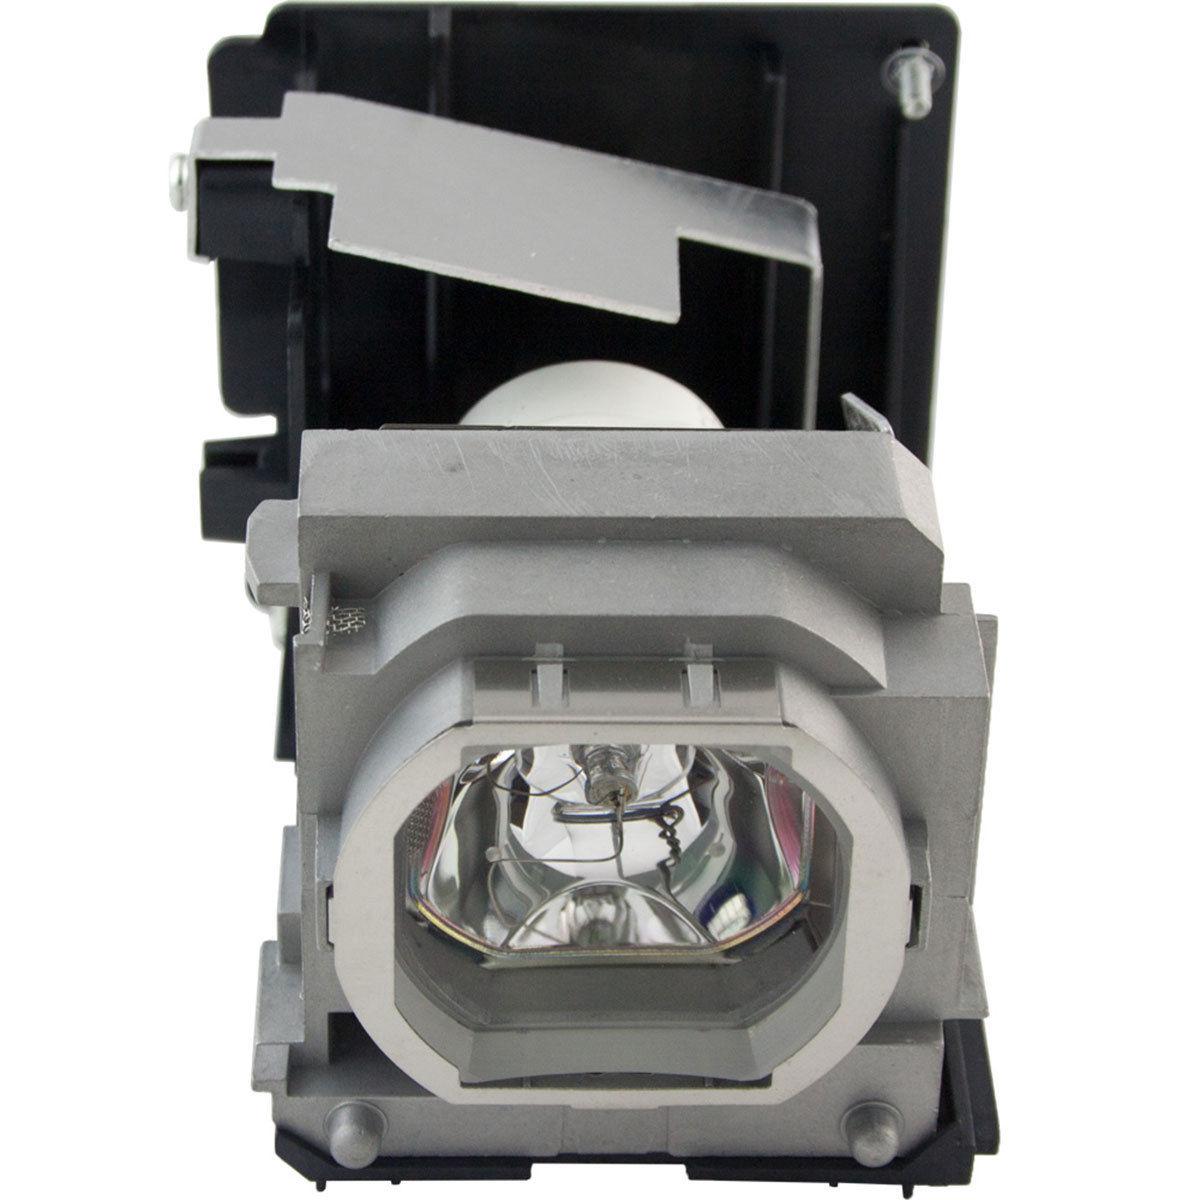 Projector Lamp Bulb VLT-HC6800LP VLTHC6800LP HC6800LP for Mitsubishi HC6800 HC6800U with housing replacement lamp bulb with housing vlt xd206lp for md307x md307s xd206u sd206u sd206